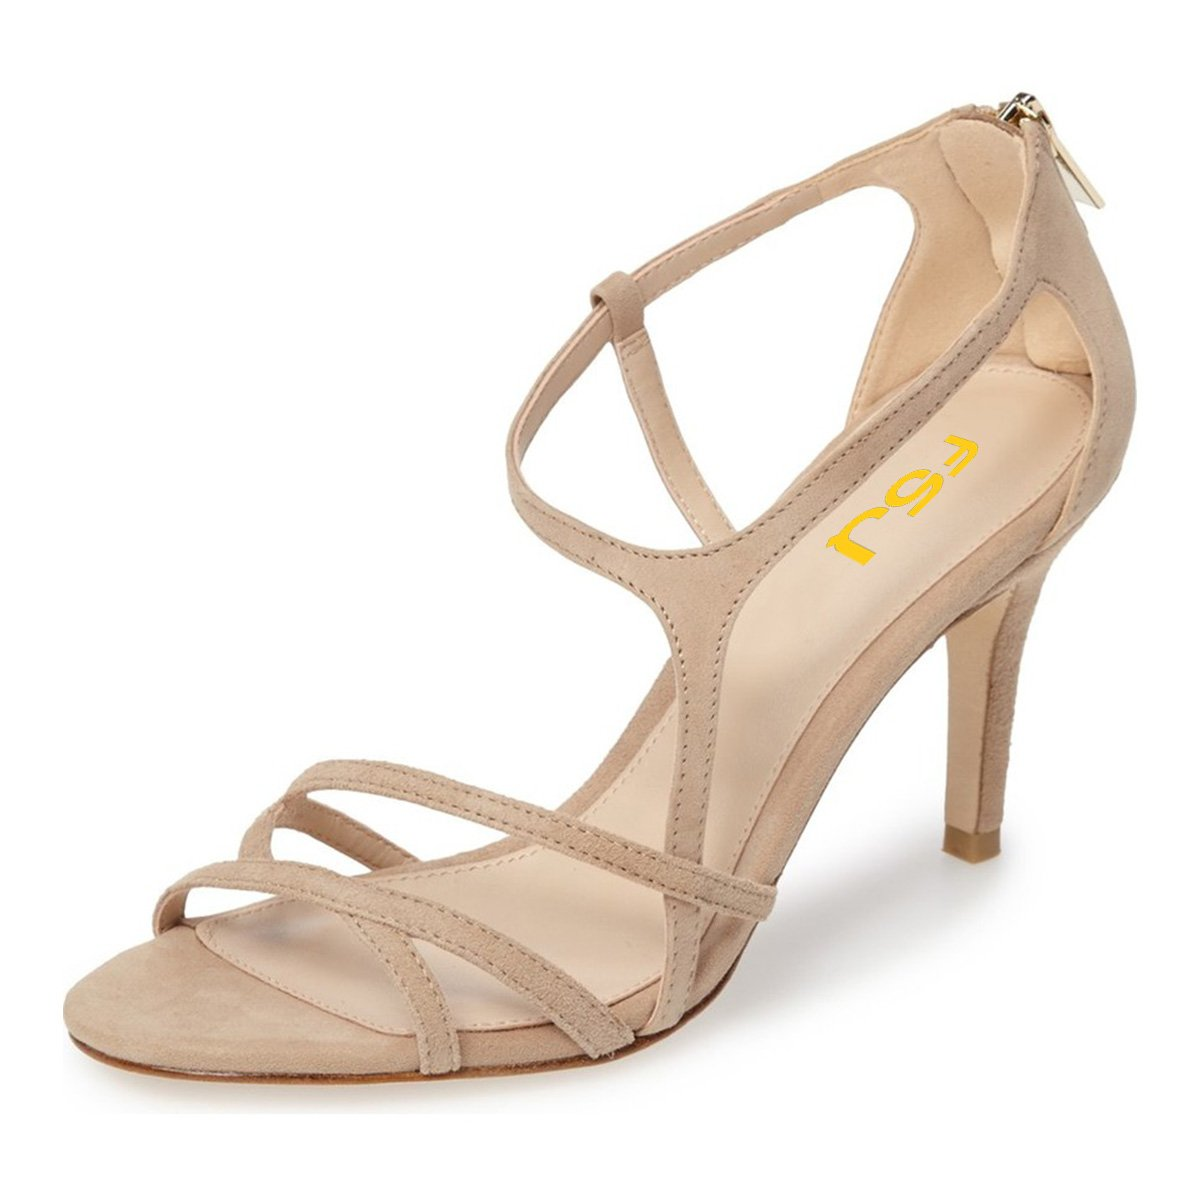 739c3374c6 FSJ Women Classy Classy Classy Strappy High Heel Sandals Cut Out Back  Zipper Evening Party Prom